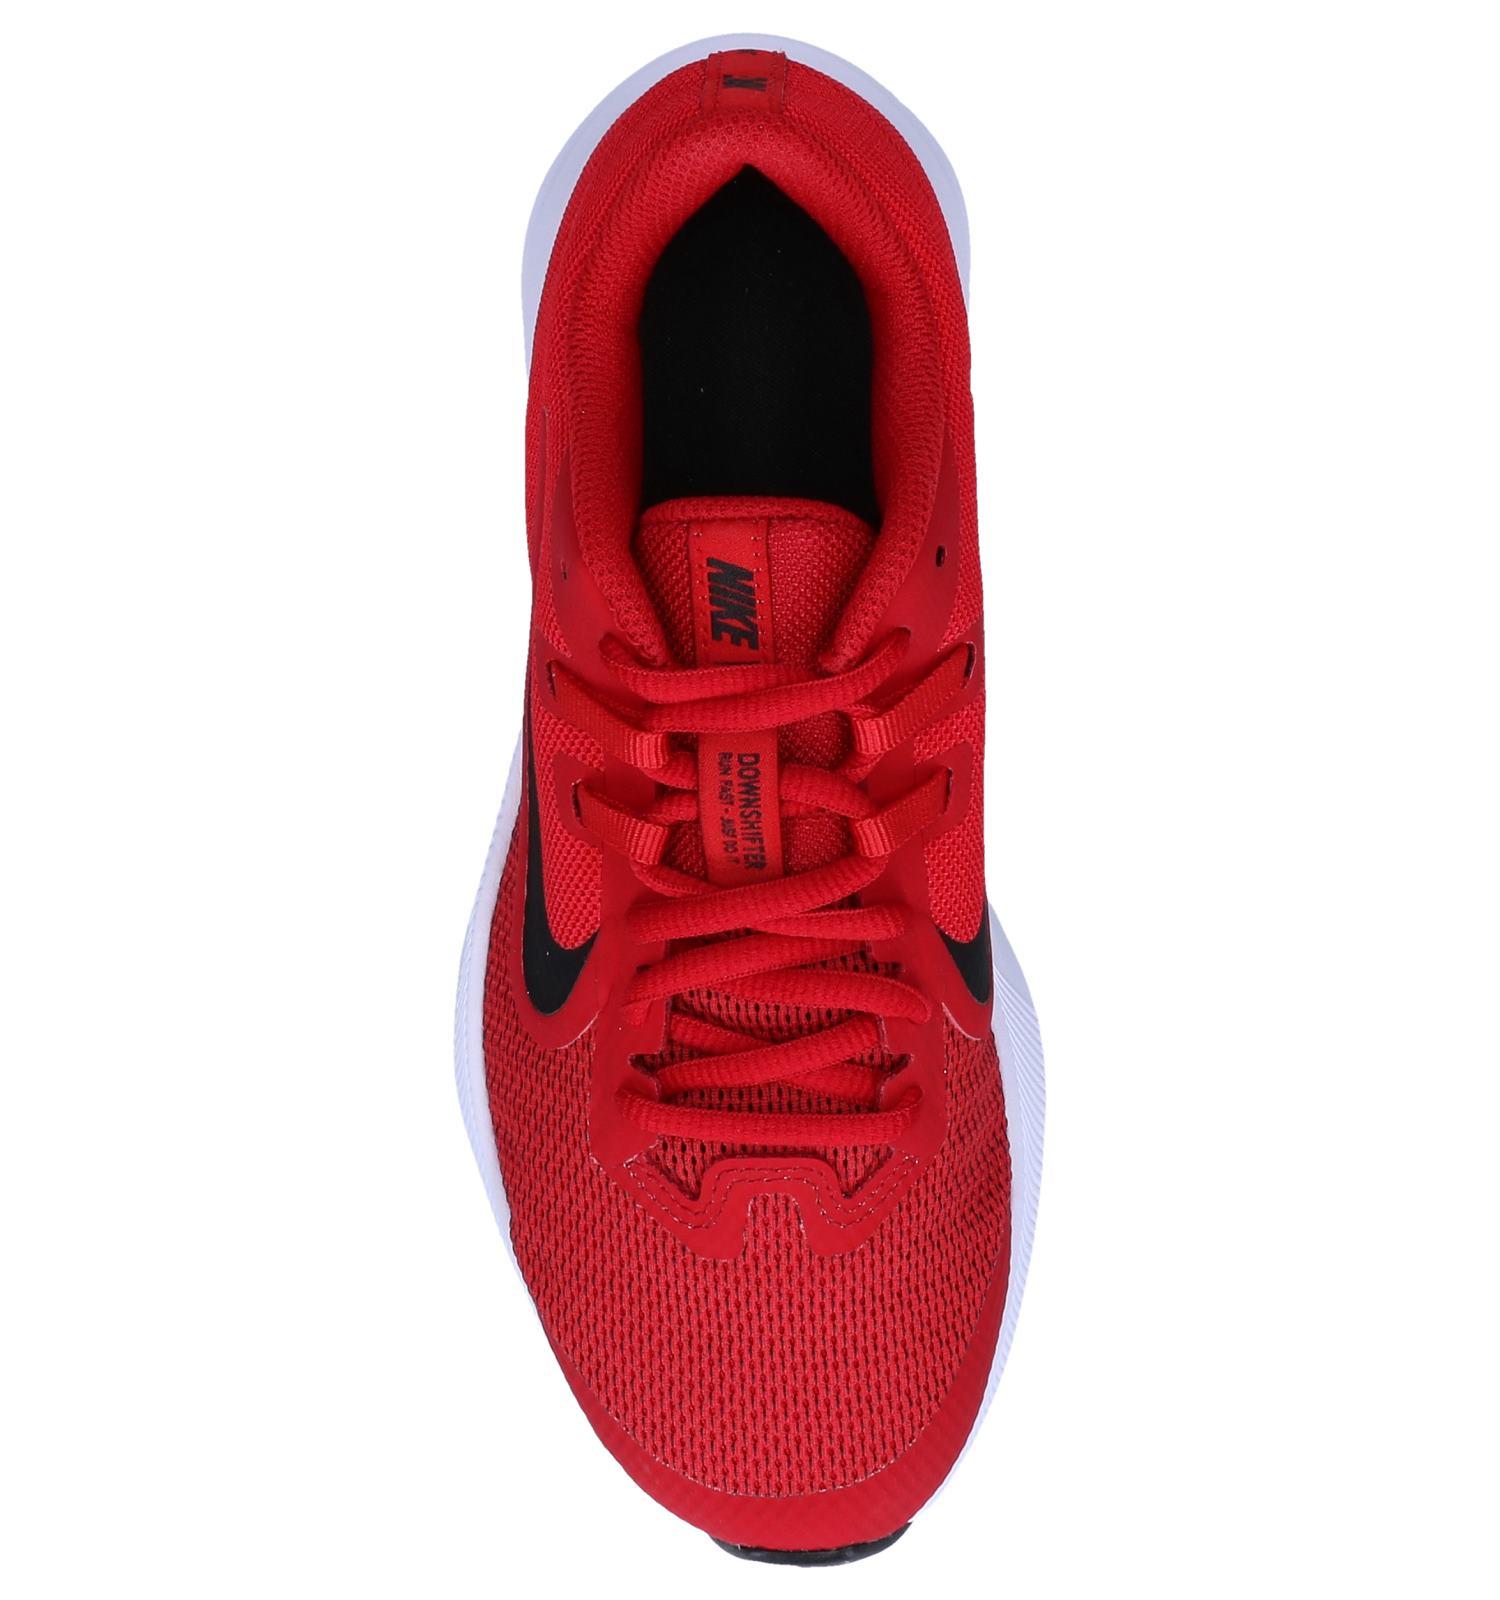 Nike Downshifter 9 Rode Sneakers | TORFS.BE | Gratis verzend en retour